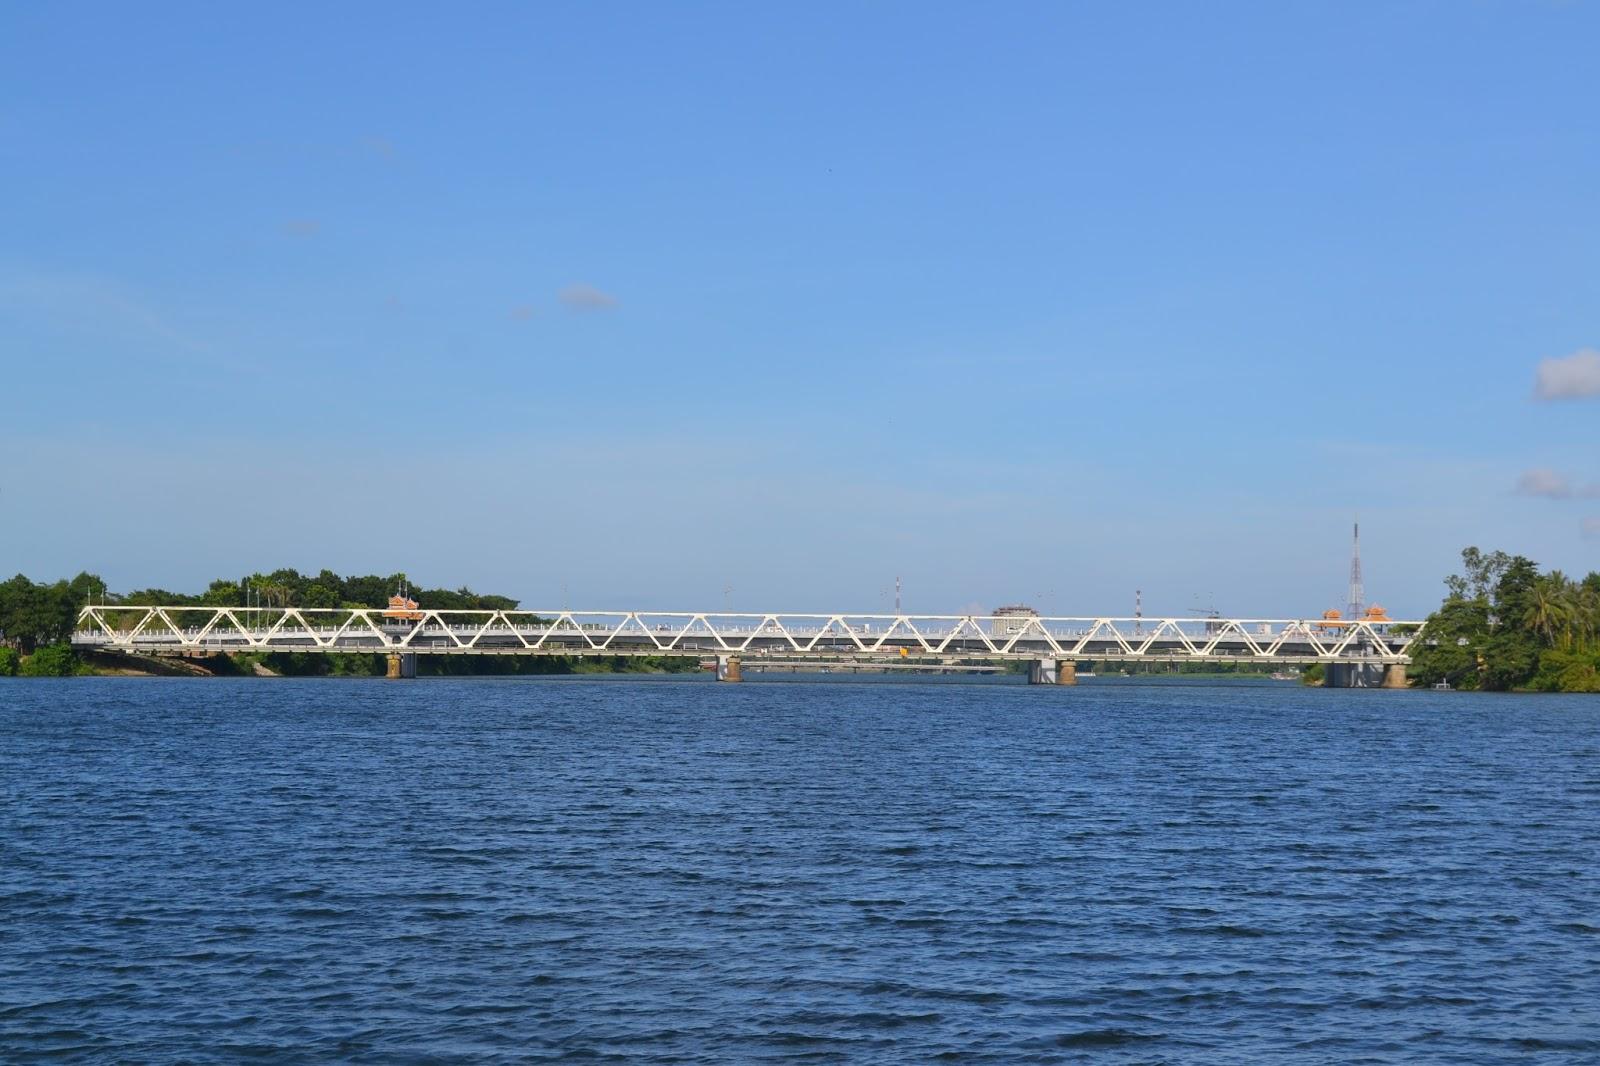 Bridge on the perfume river, hue